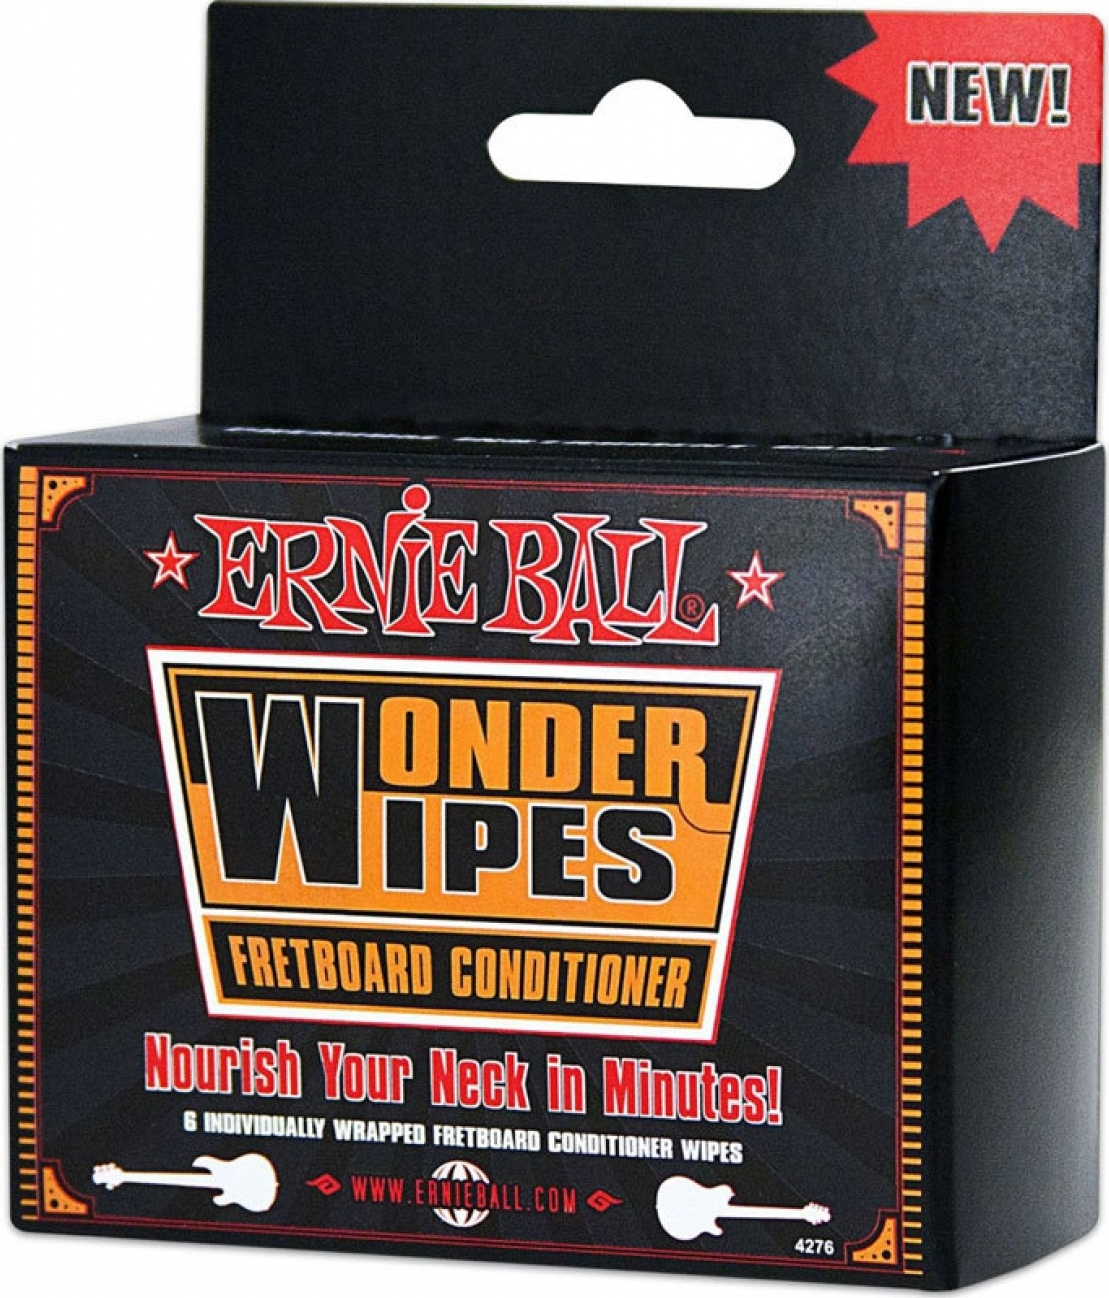 Средство для чистки грифа (салфетки) Ernie Ball 4276 педаль эффектов ernie ball 250k mono volume pedal